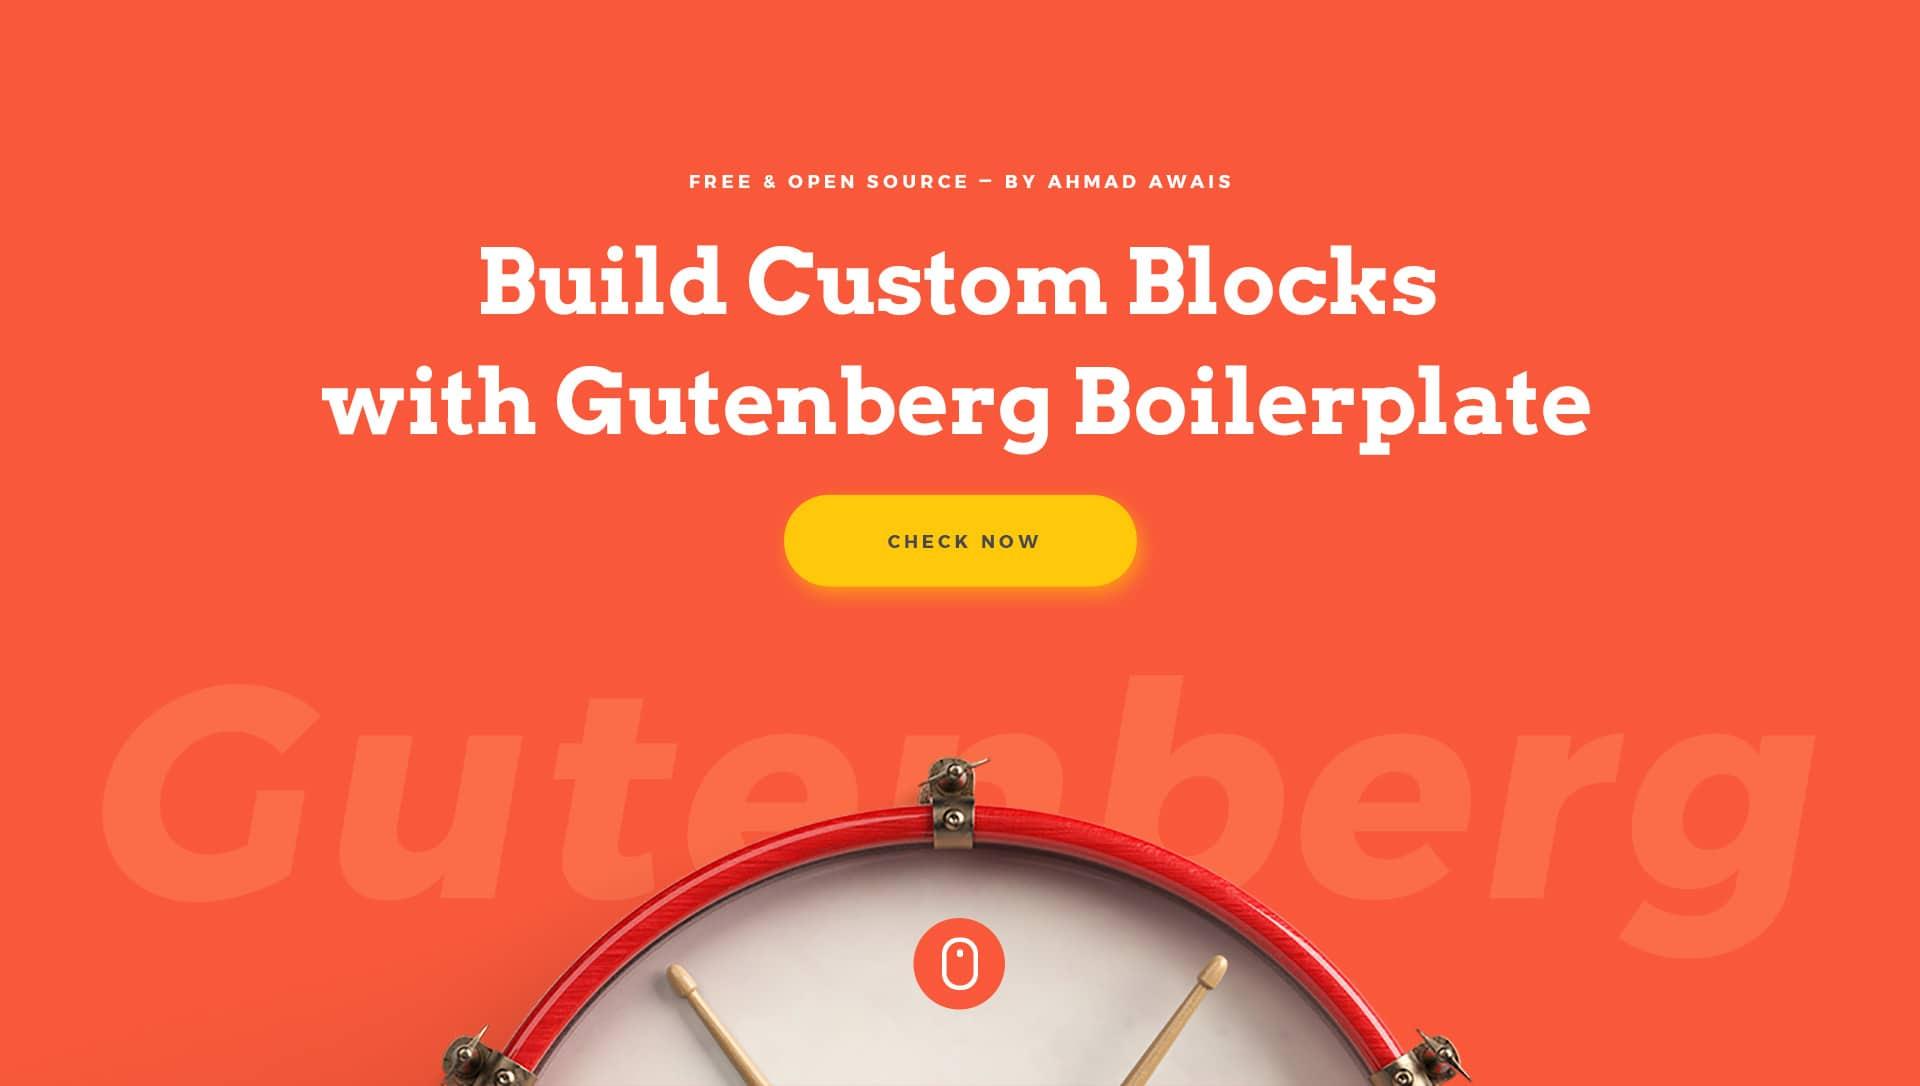 Gutenberg-boilerplate